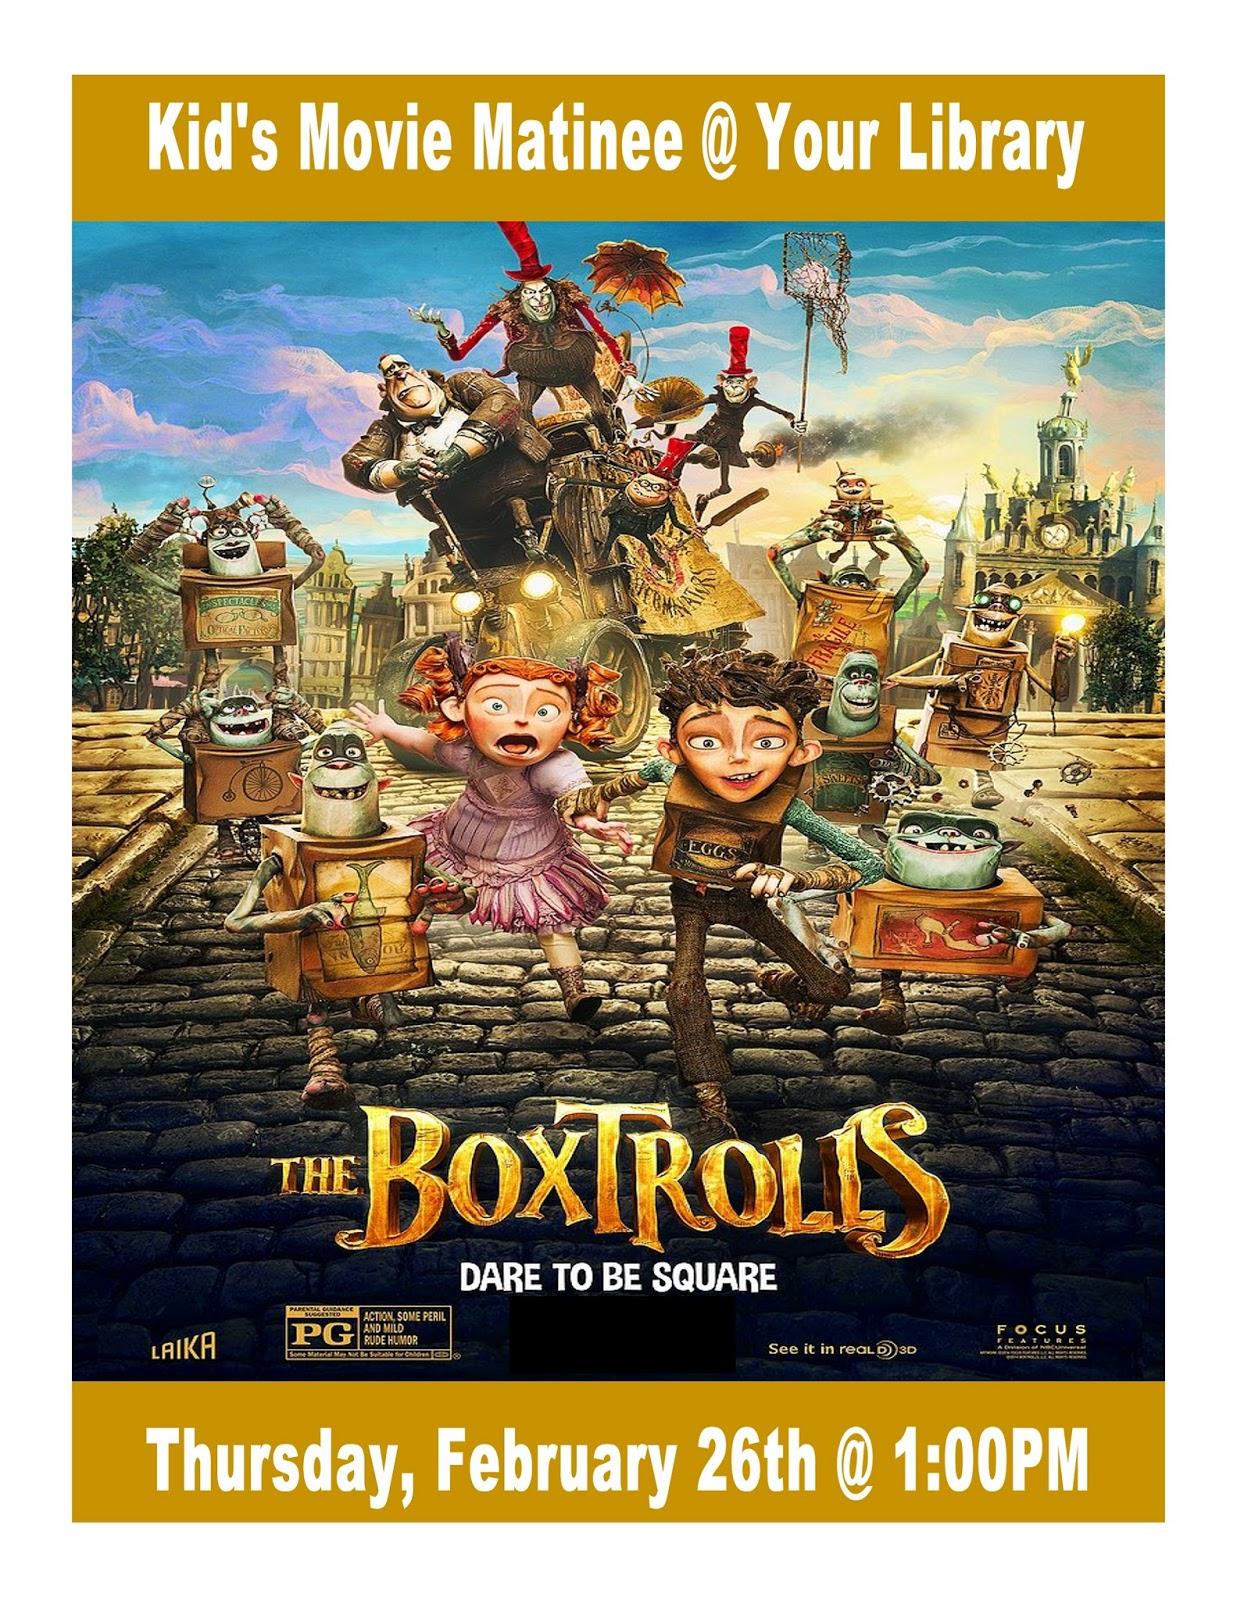 Box Trolls movie poster